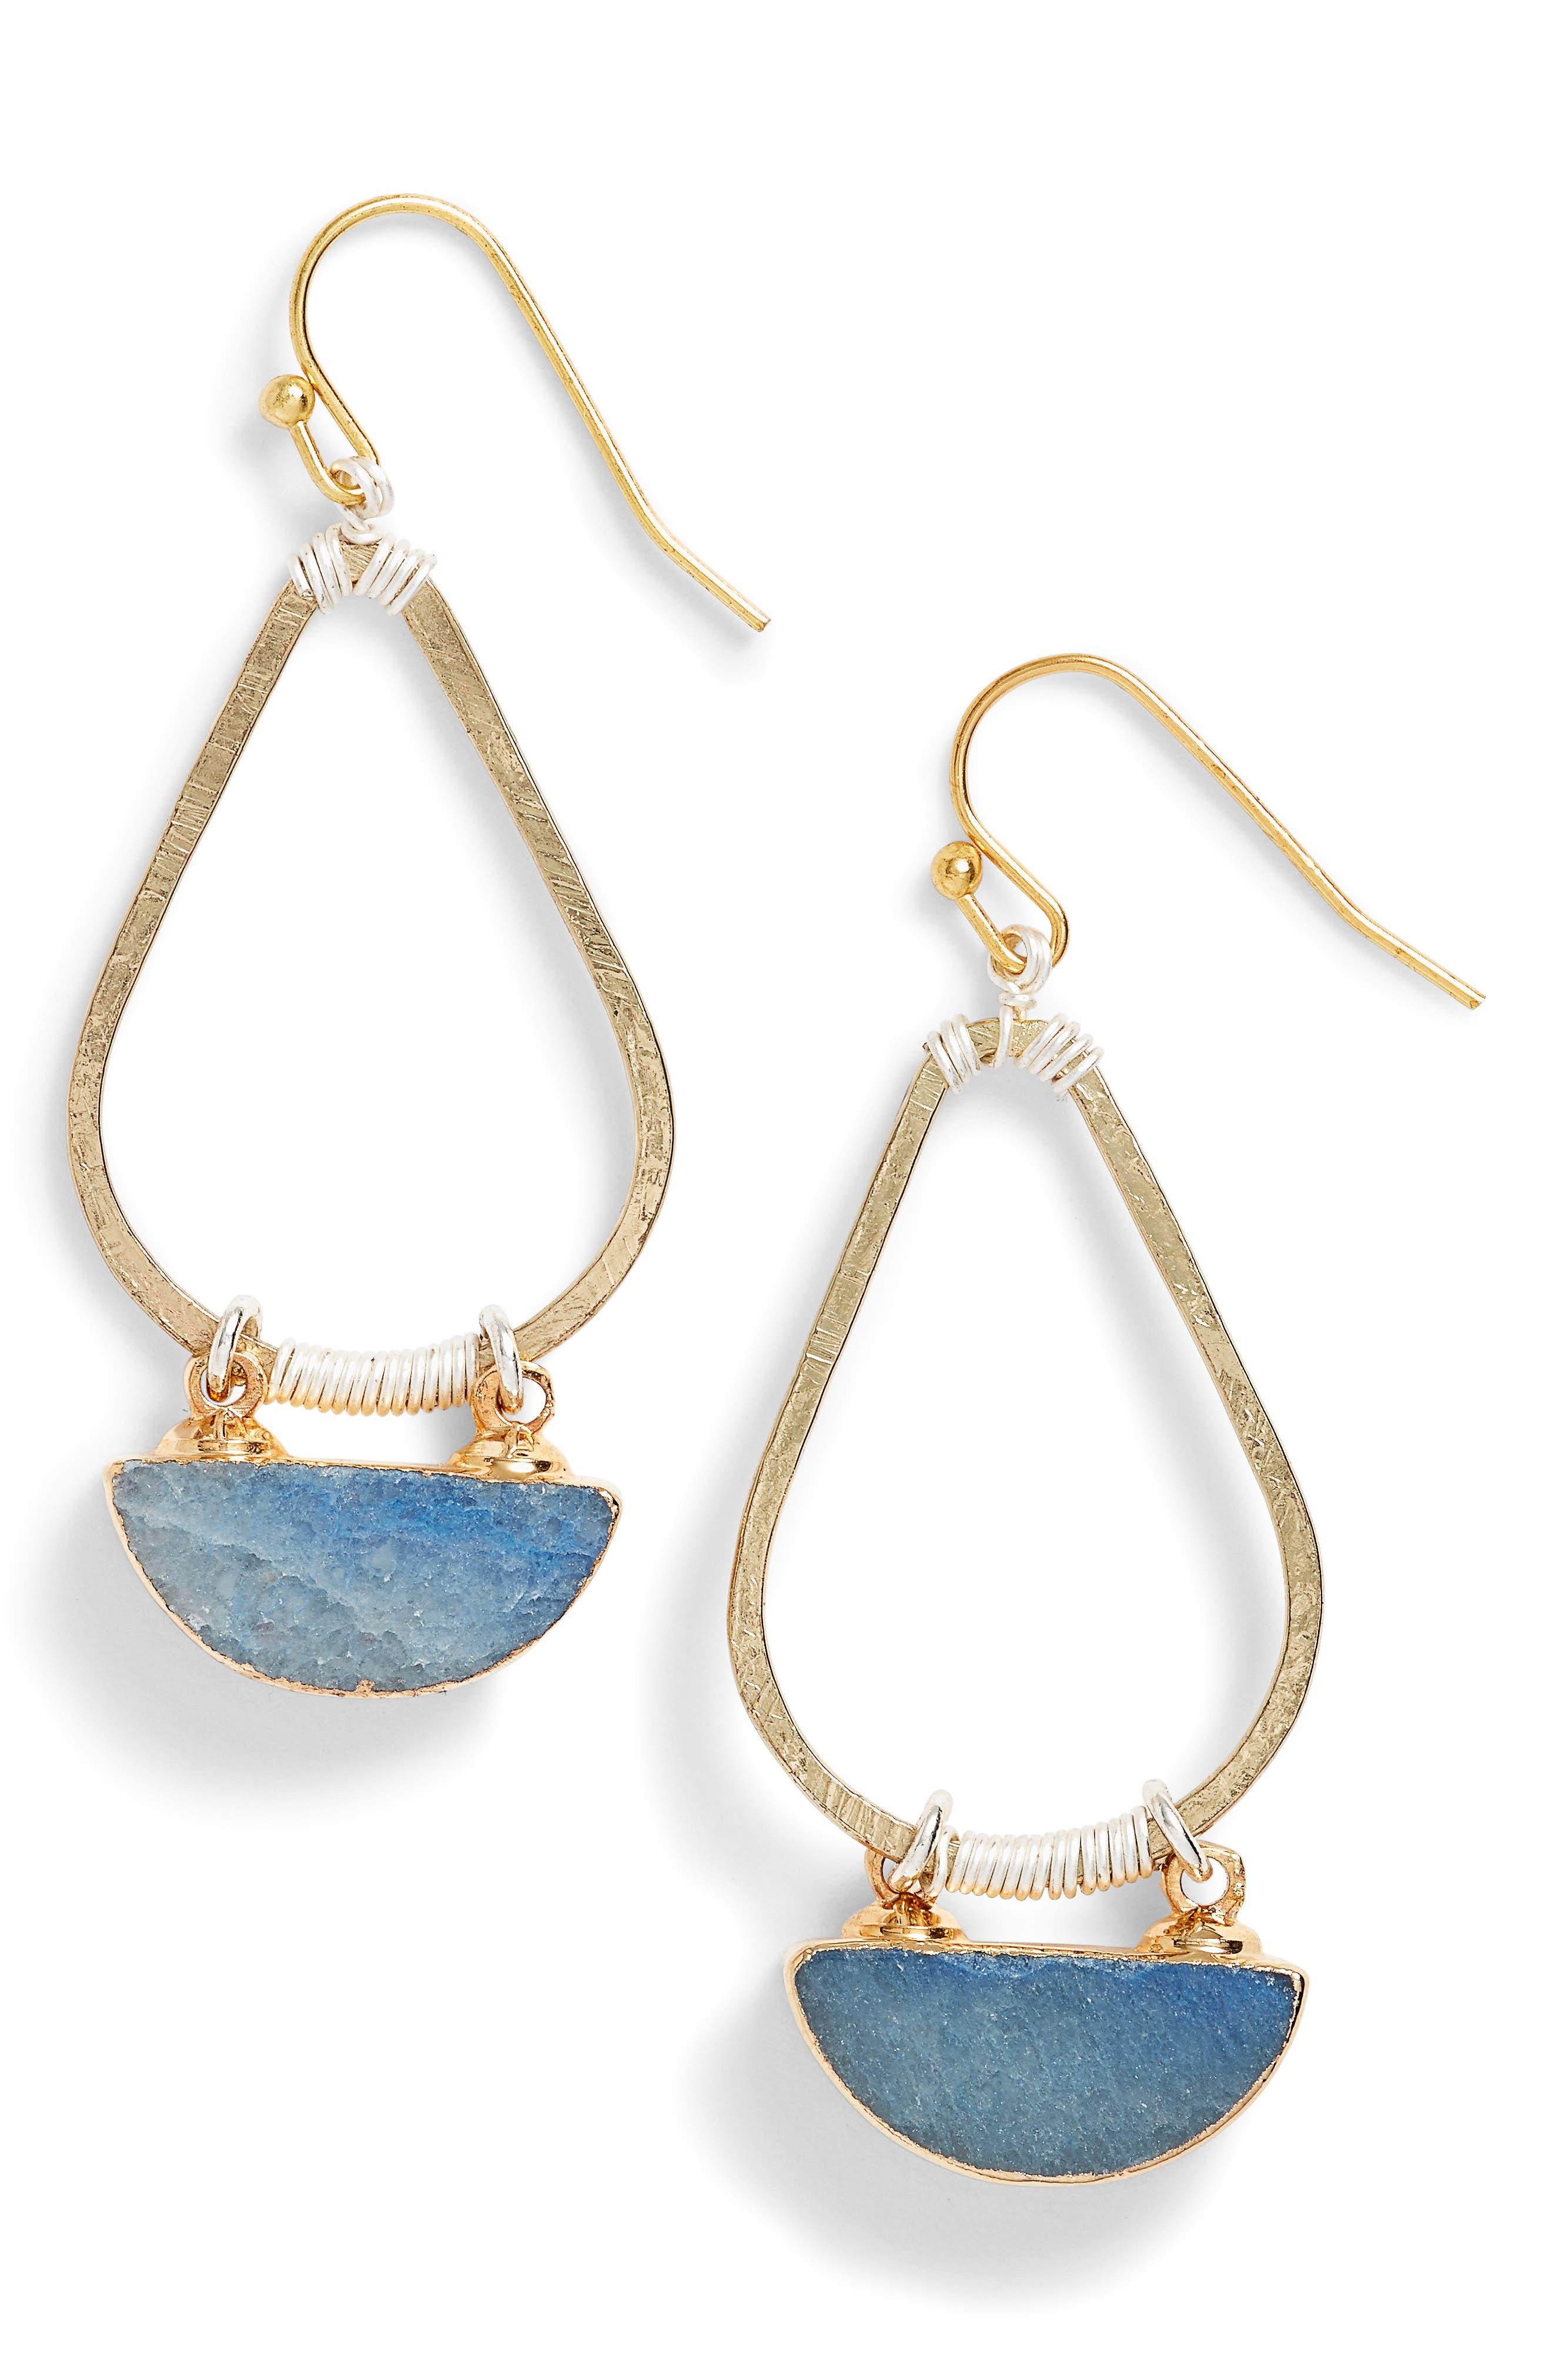 Bahar Lapis Teardrop Earrings,                         Main,                         color, Blue